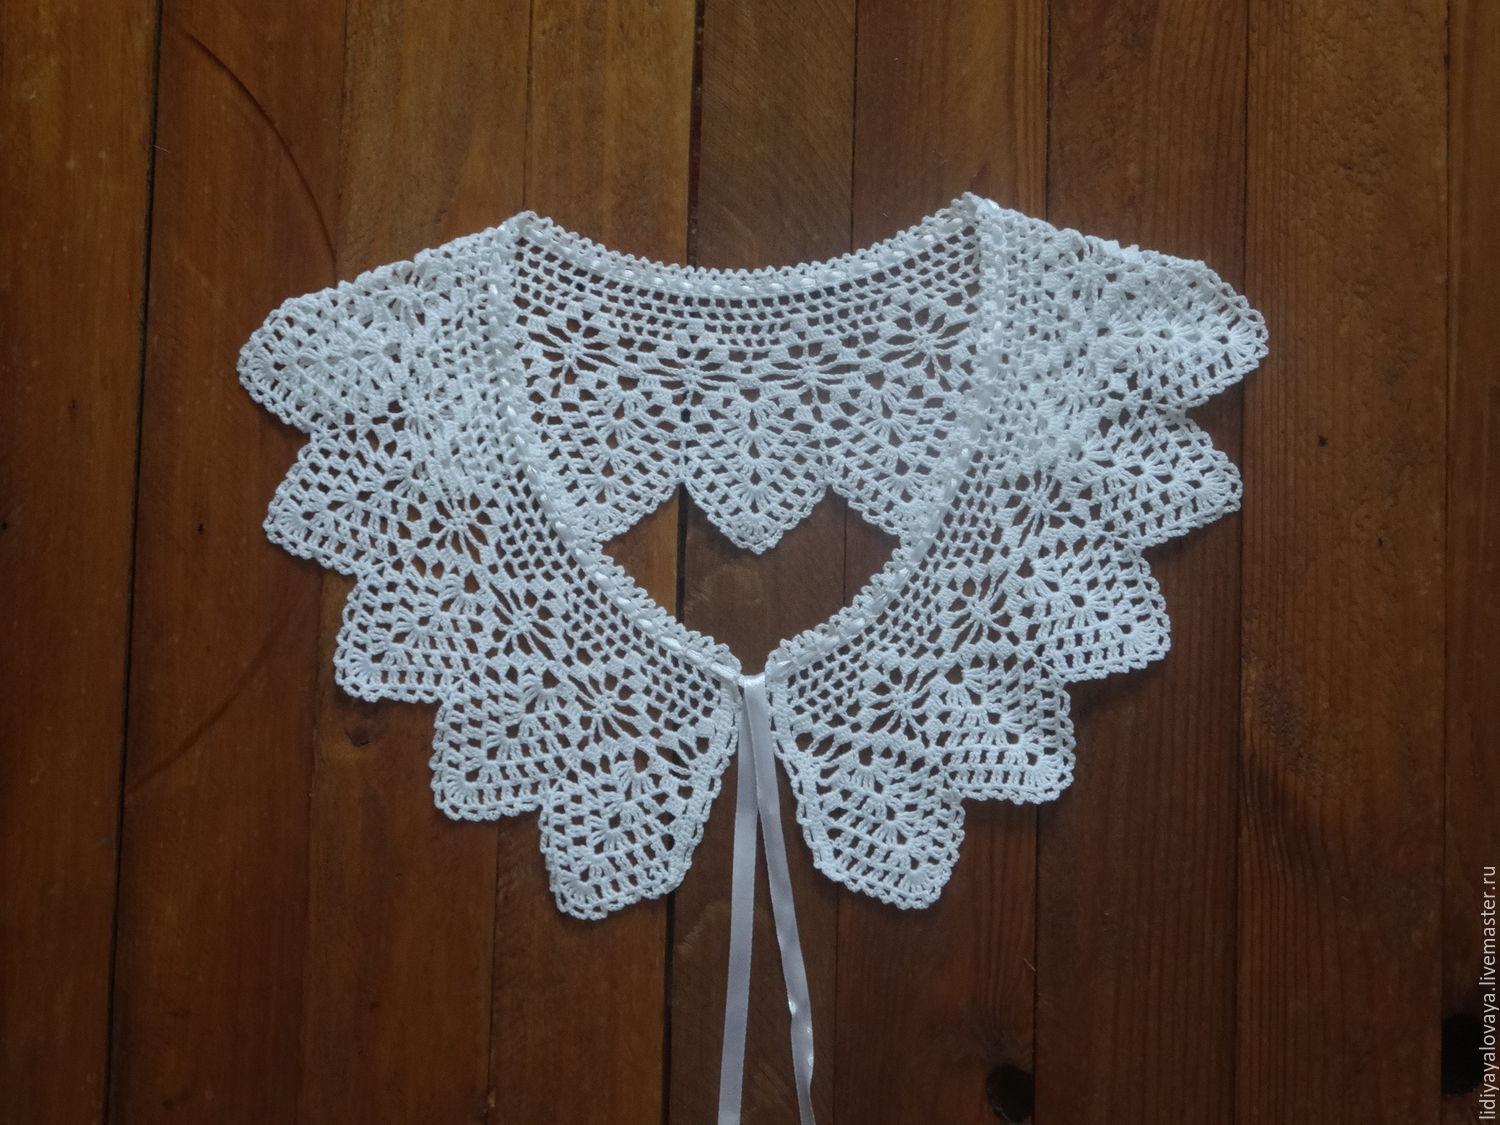 lace collar, collar, fishnet, collar, crochet, buy crochet lace collar, buy collar, buy slip collar, the collar knitted, handmade lace.